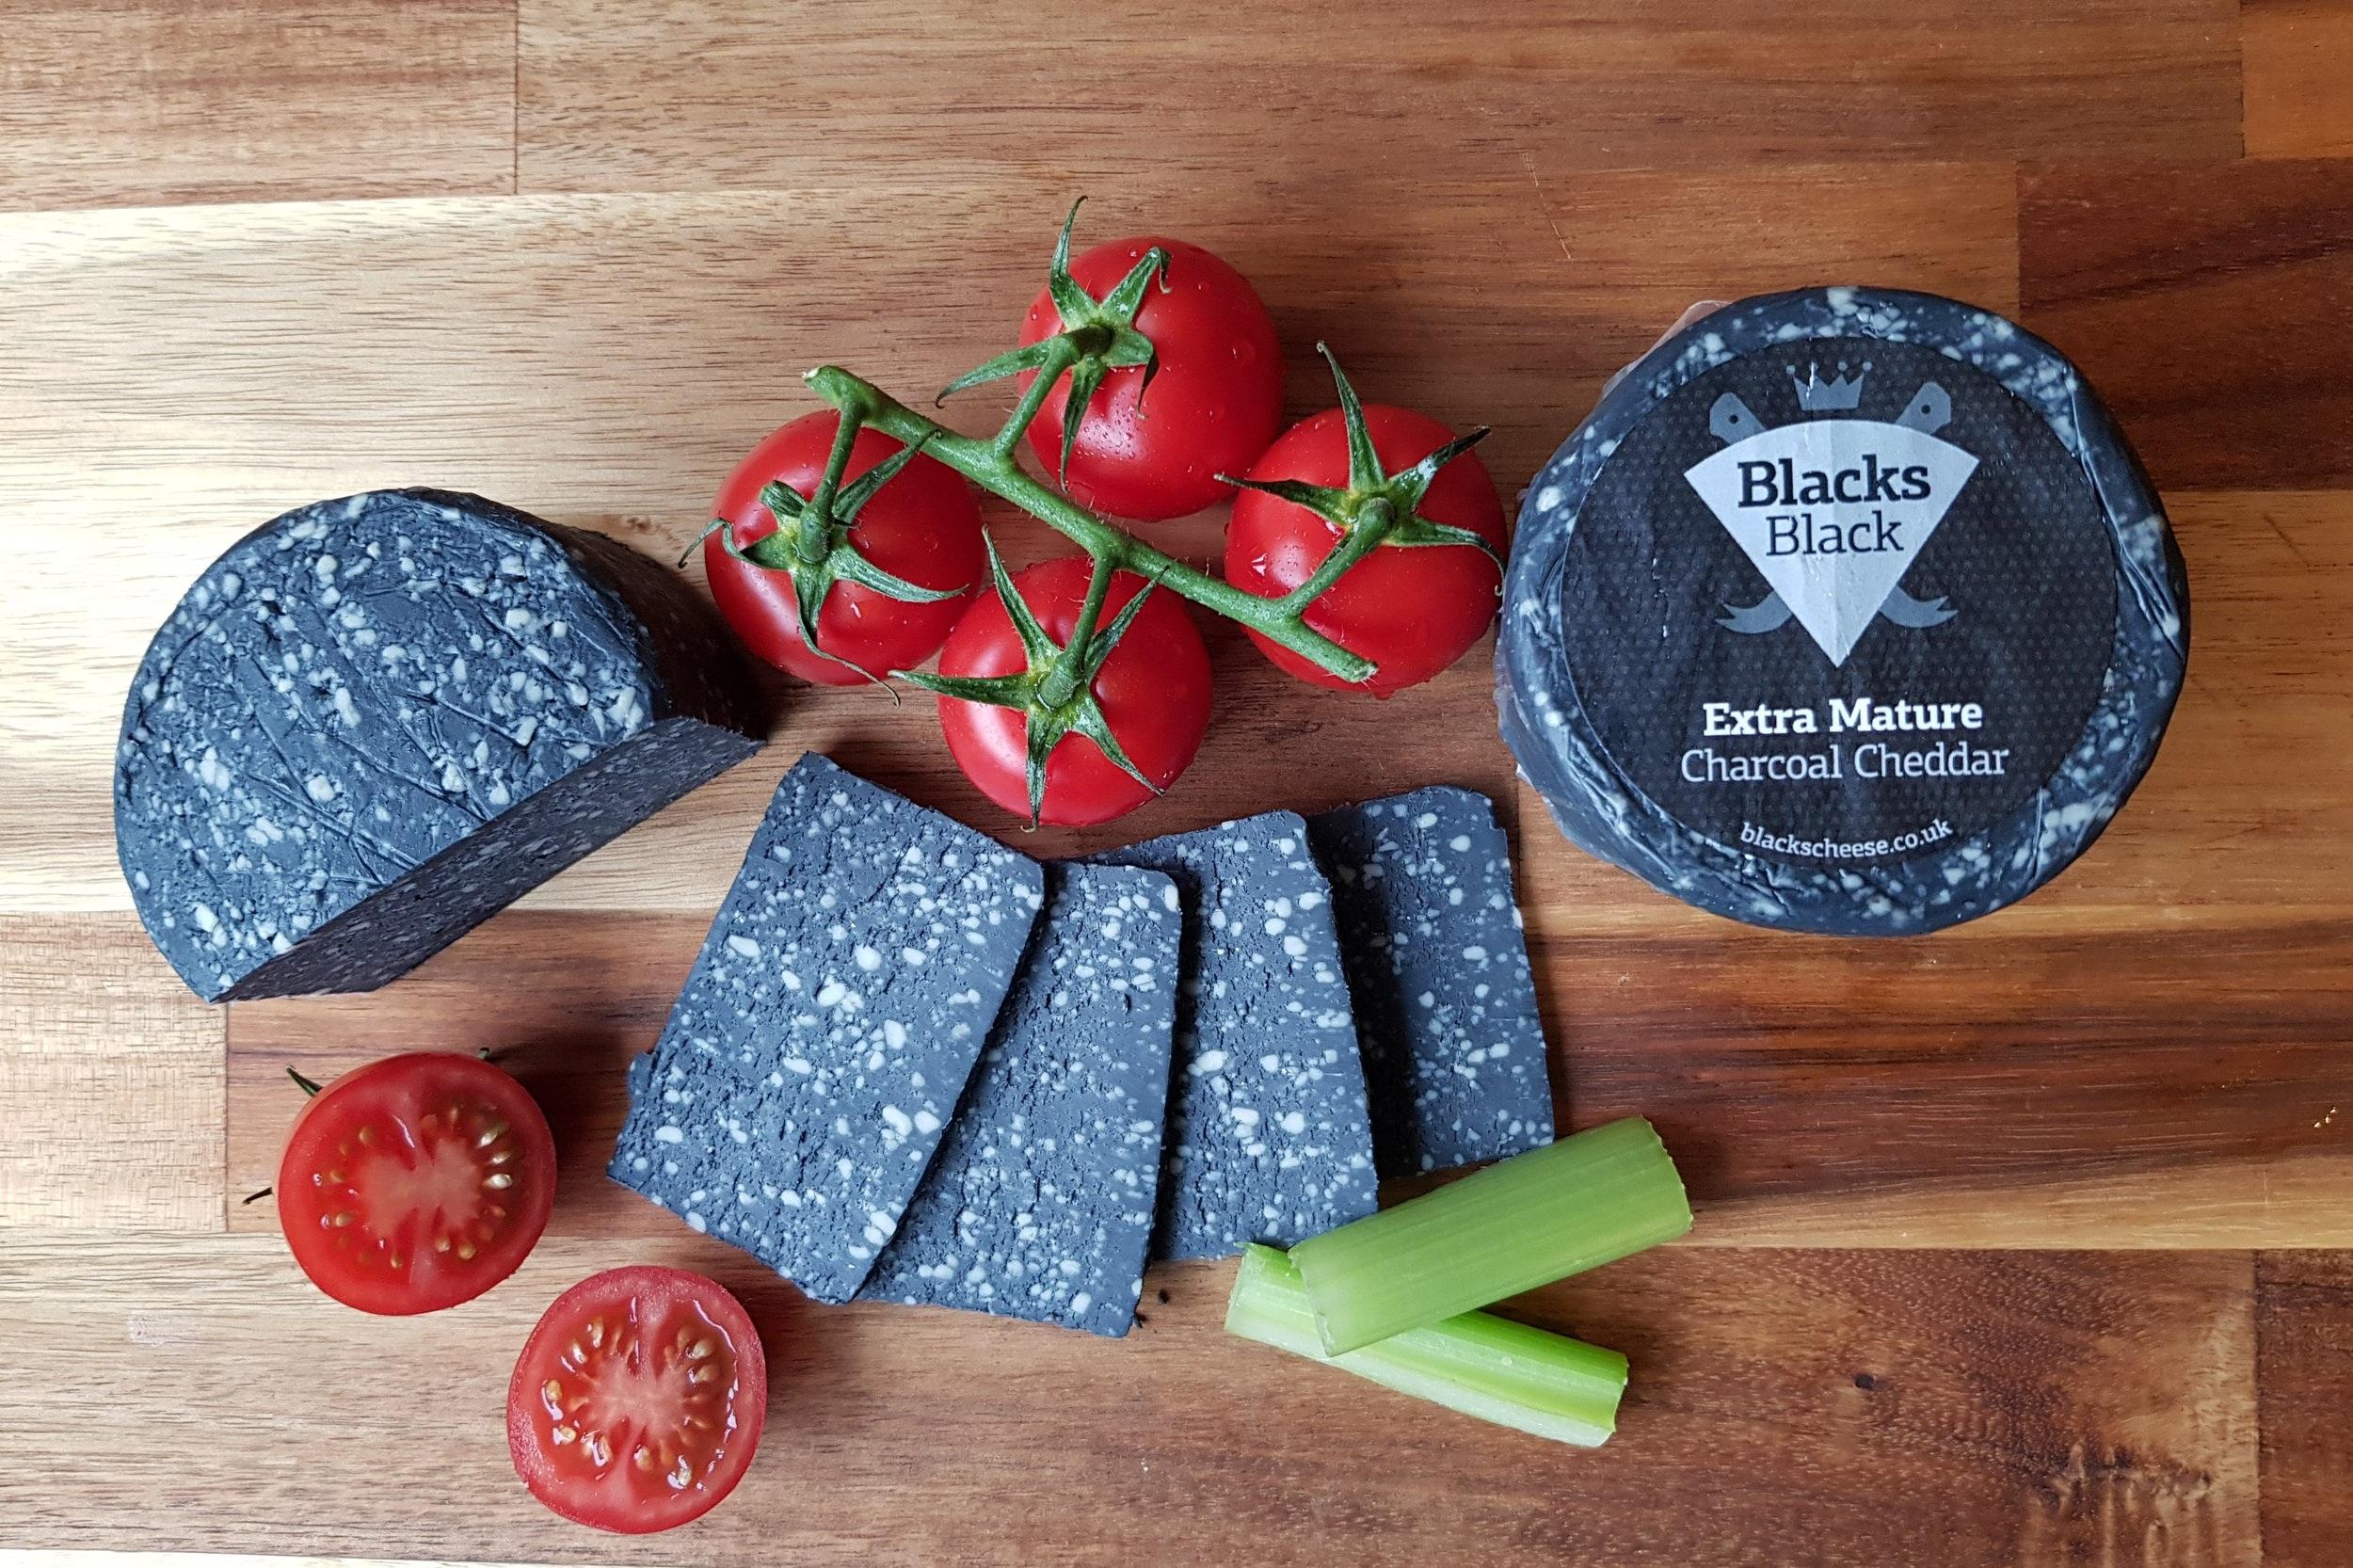 Black's Cheese